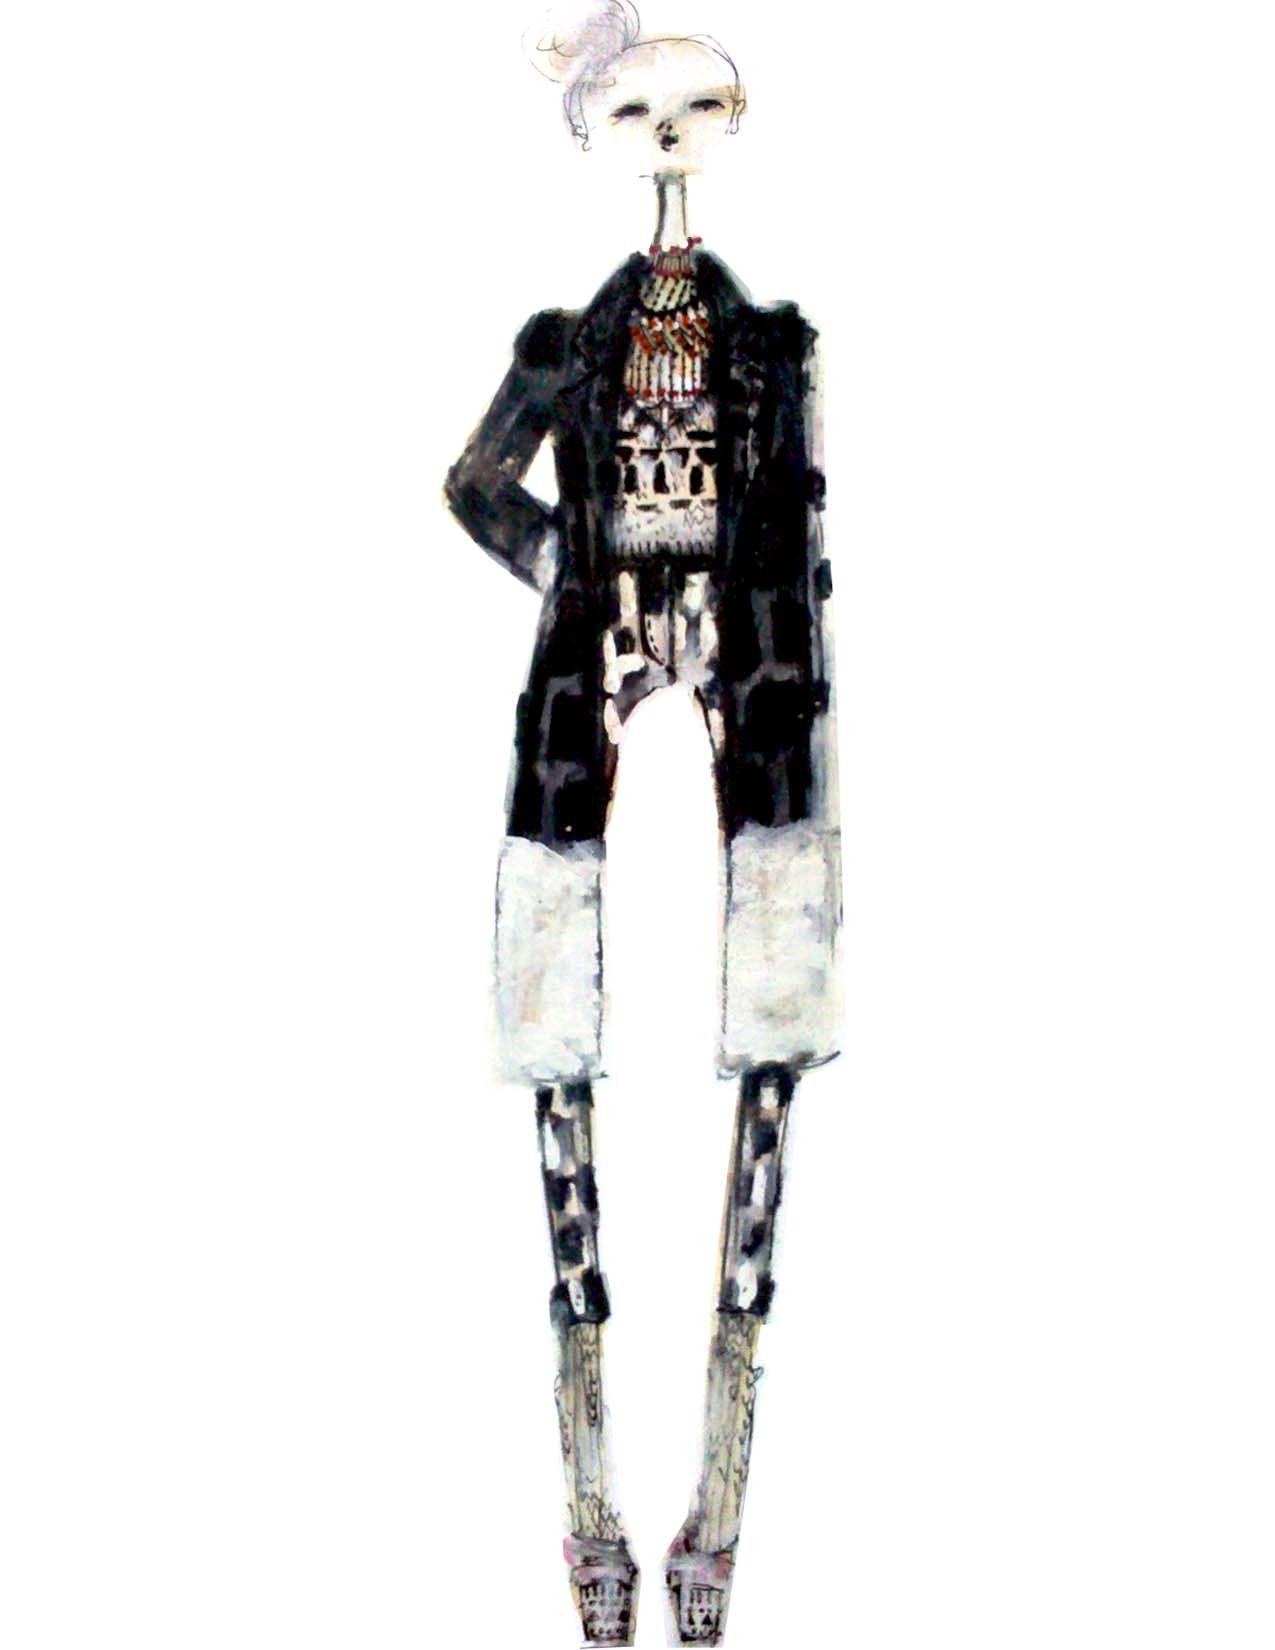 amanda henderson knits / illustration in mixed media